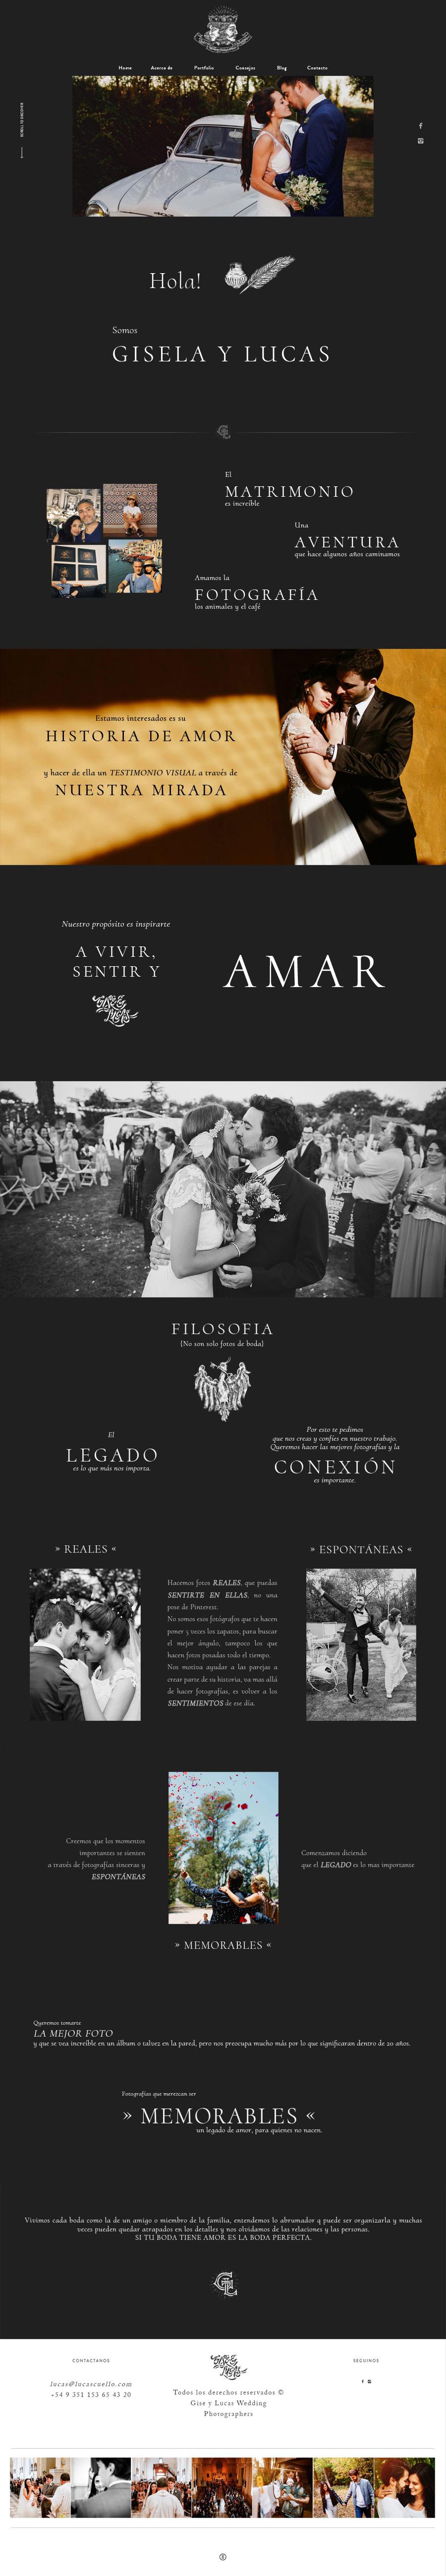 Photography website para Gise & Lucas Wedding photographers. Trabajamos bajo la plataforma de Flothemes. La Vuelta Web